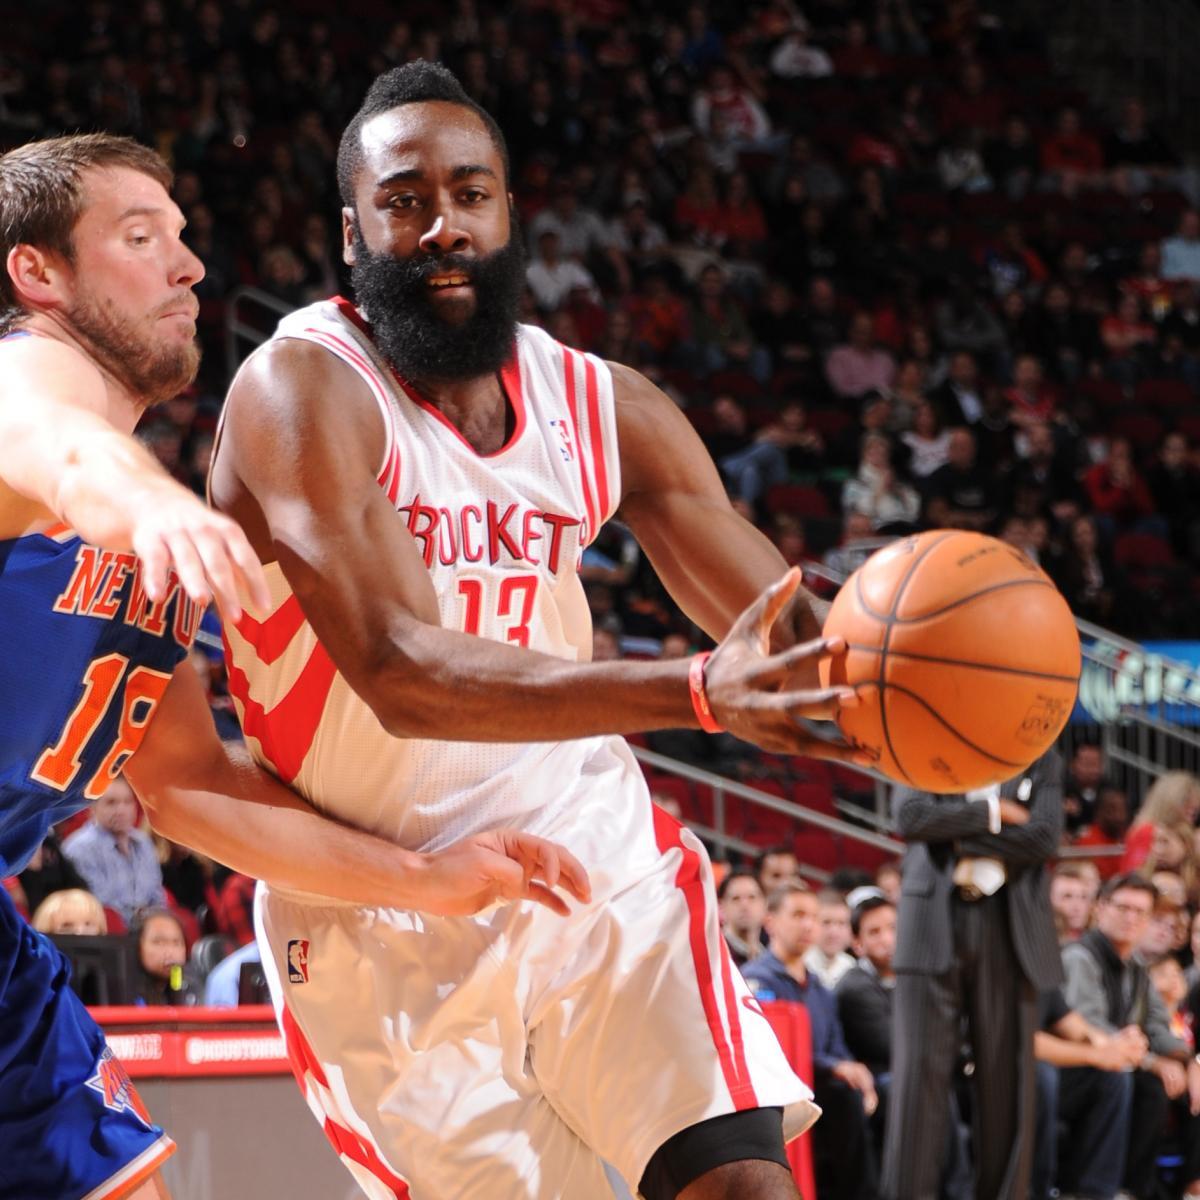 Houston Rockets Win Last Night: New York Knicks Vs. Houston Rockets: Live Score And